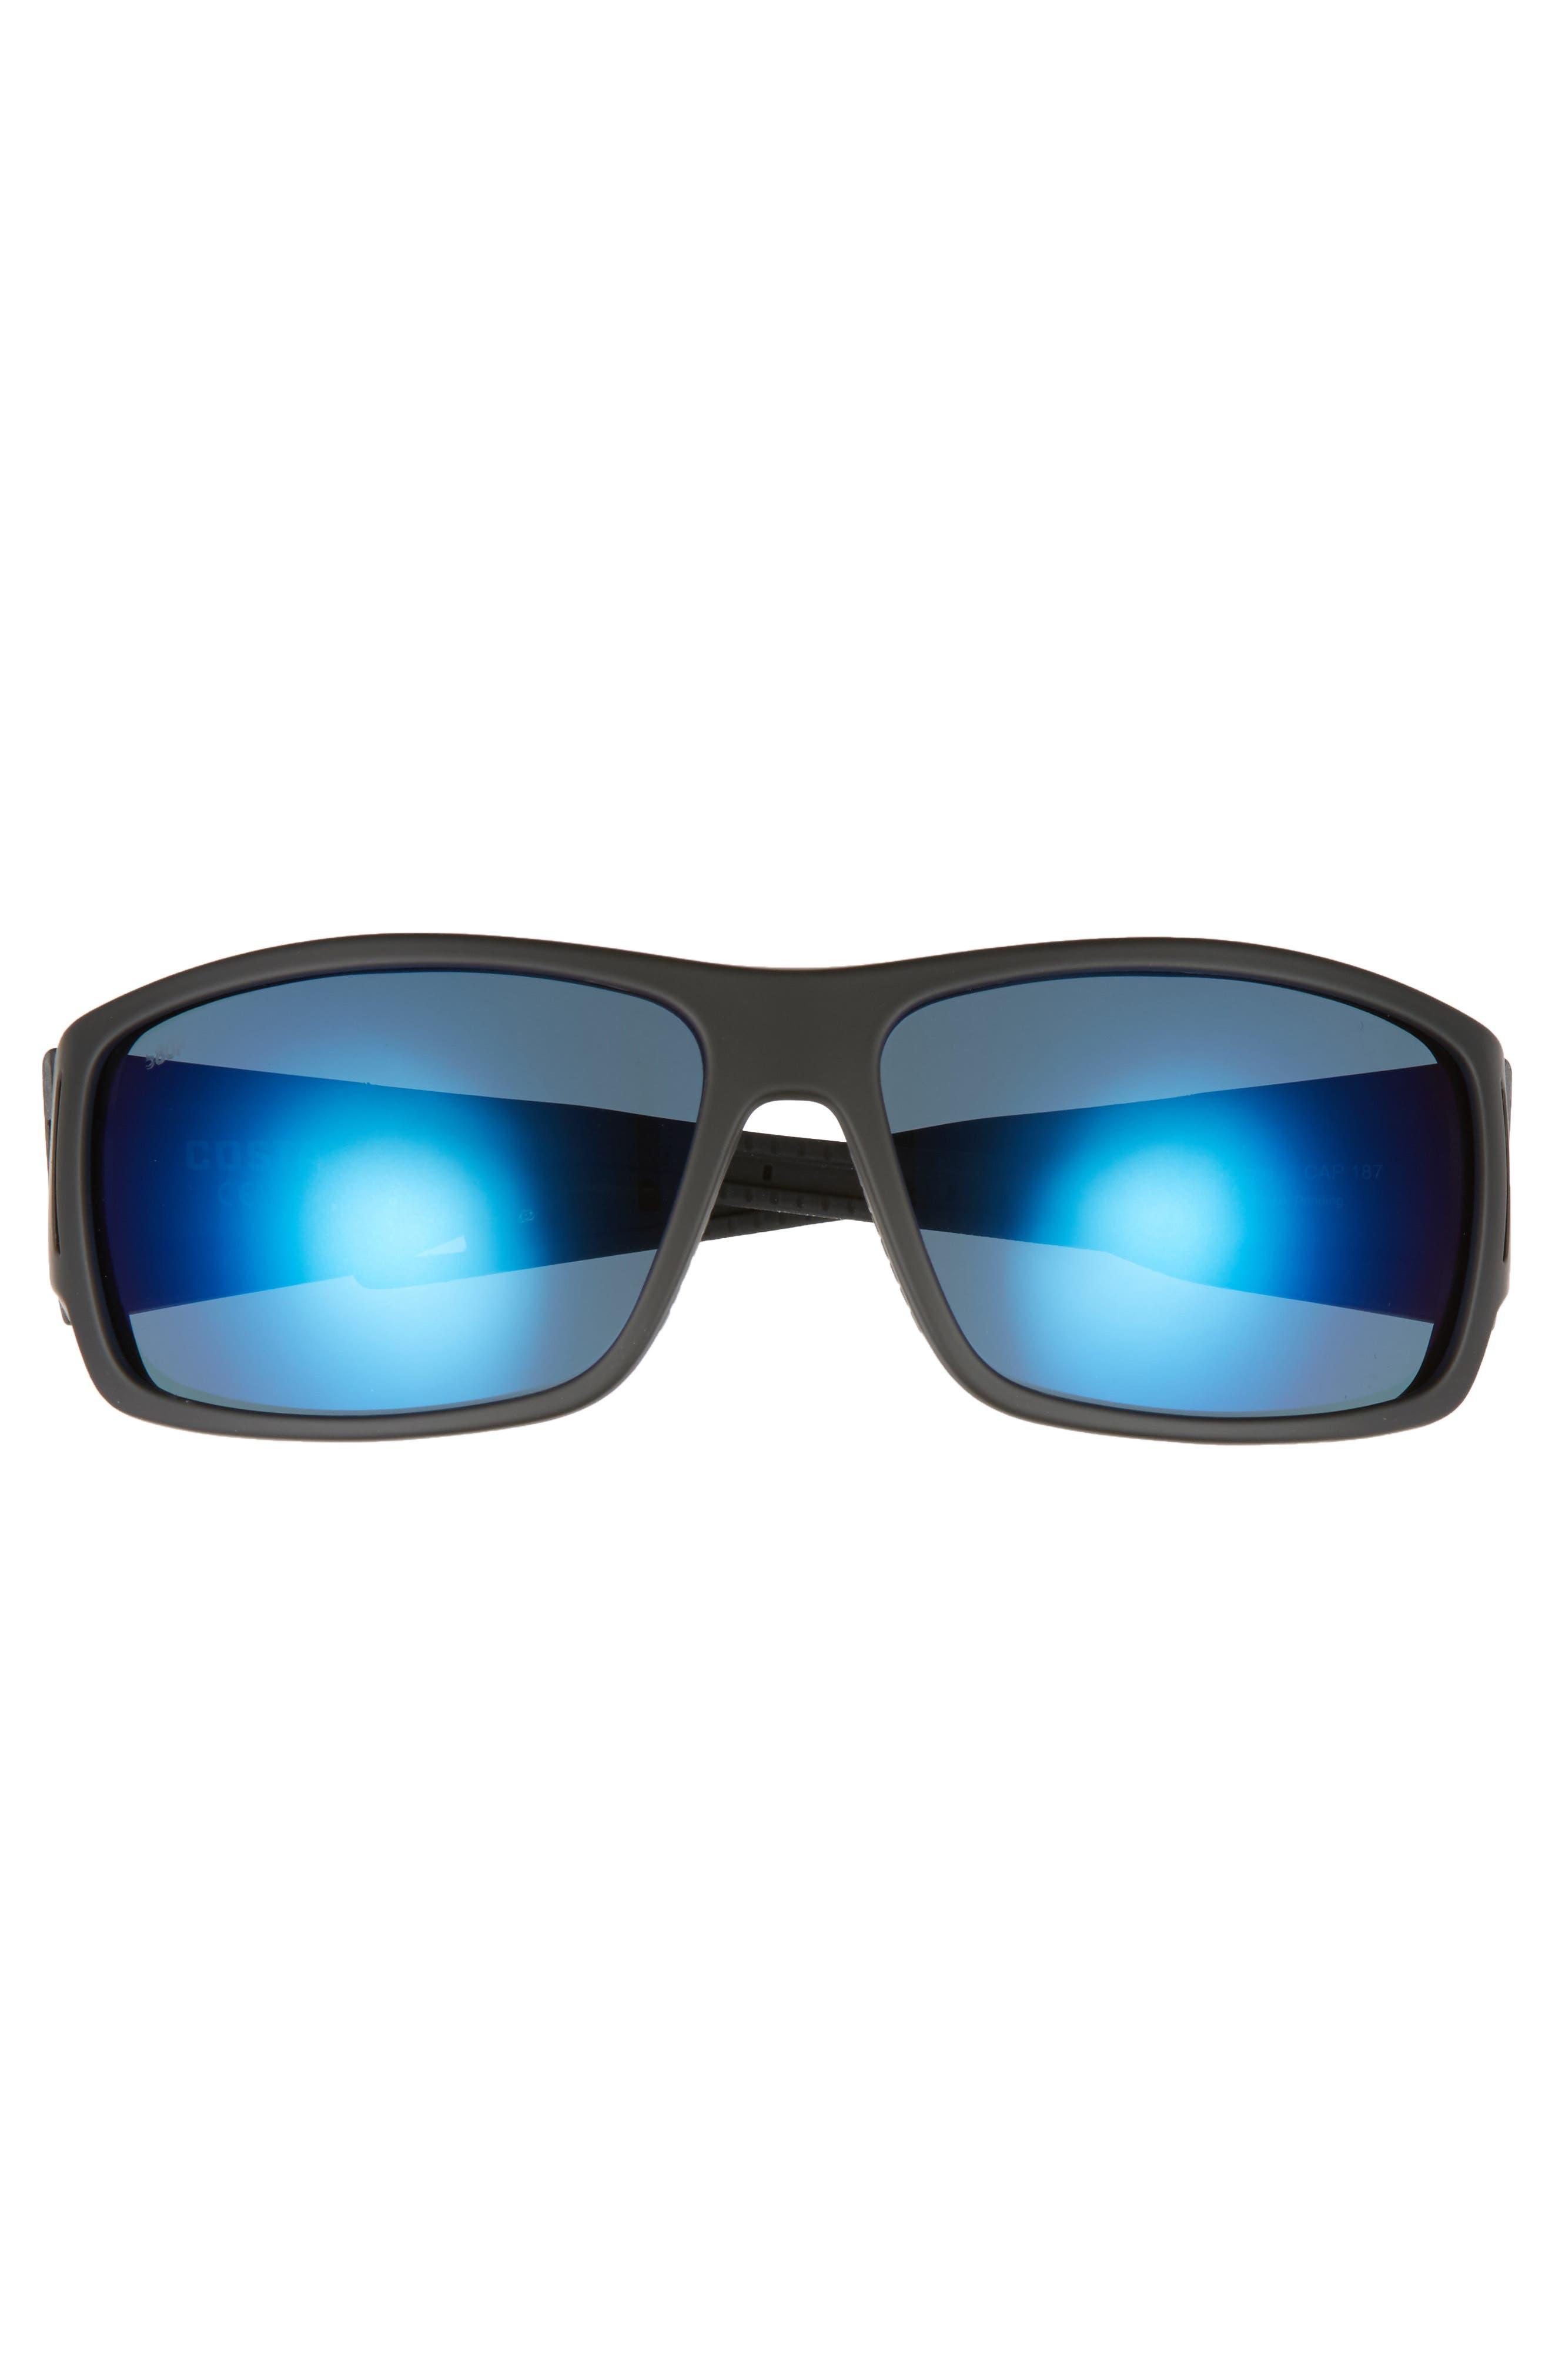 Cape 68mm Polarized Sunglasses,                             Alternate thumbnail 2, color,                             Matte Black/ Blue Mirror